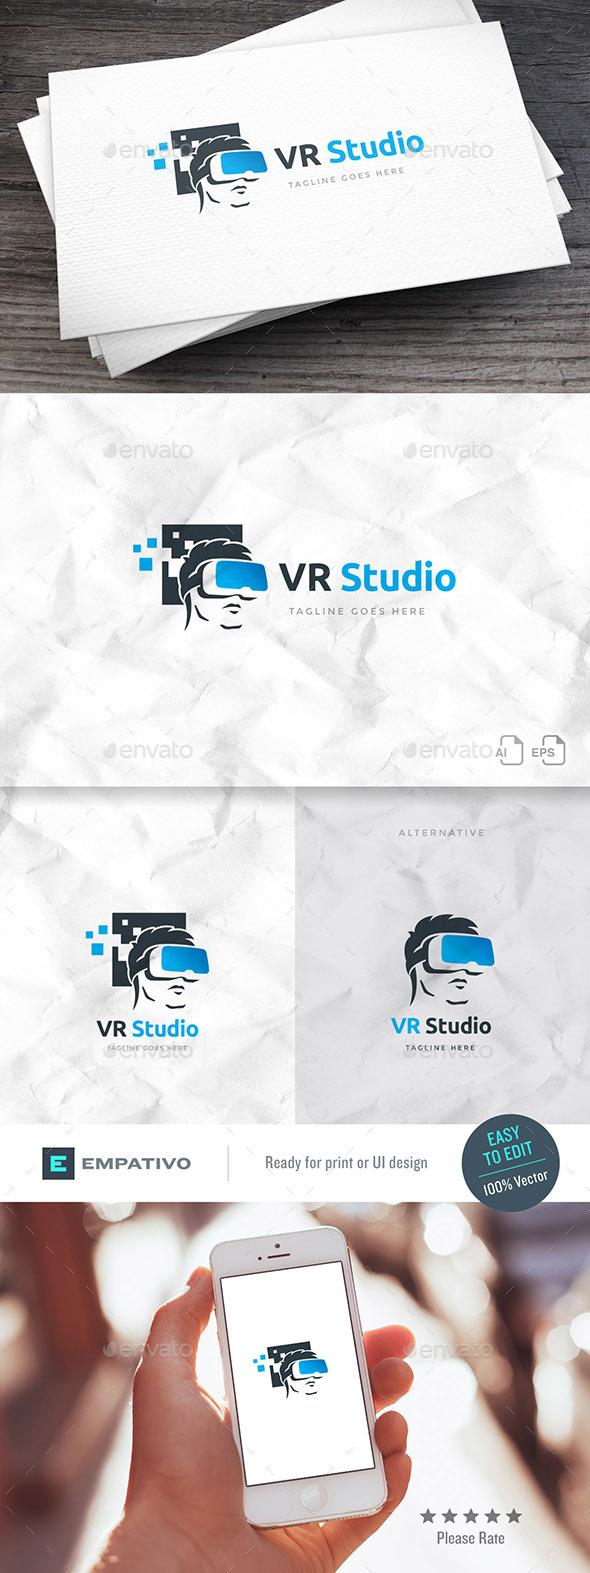 VR Studio Logo Template